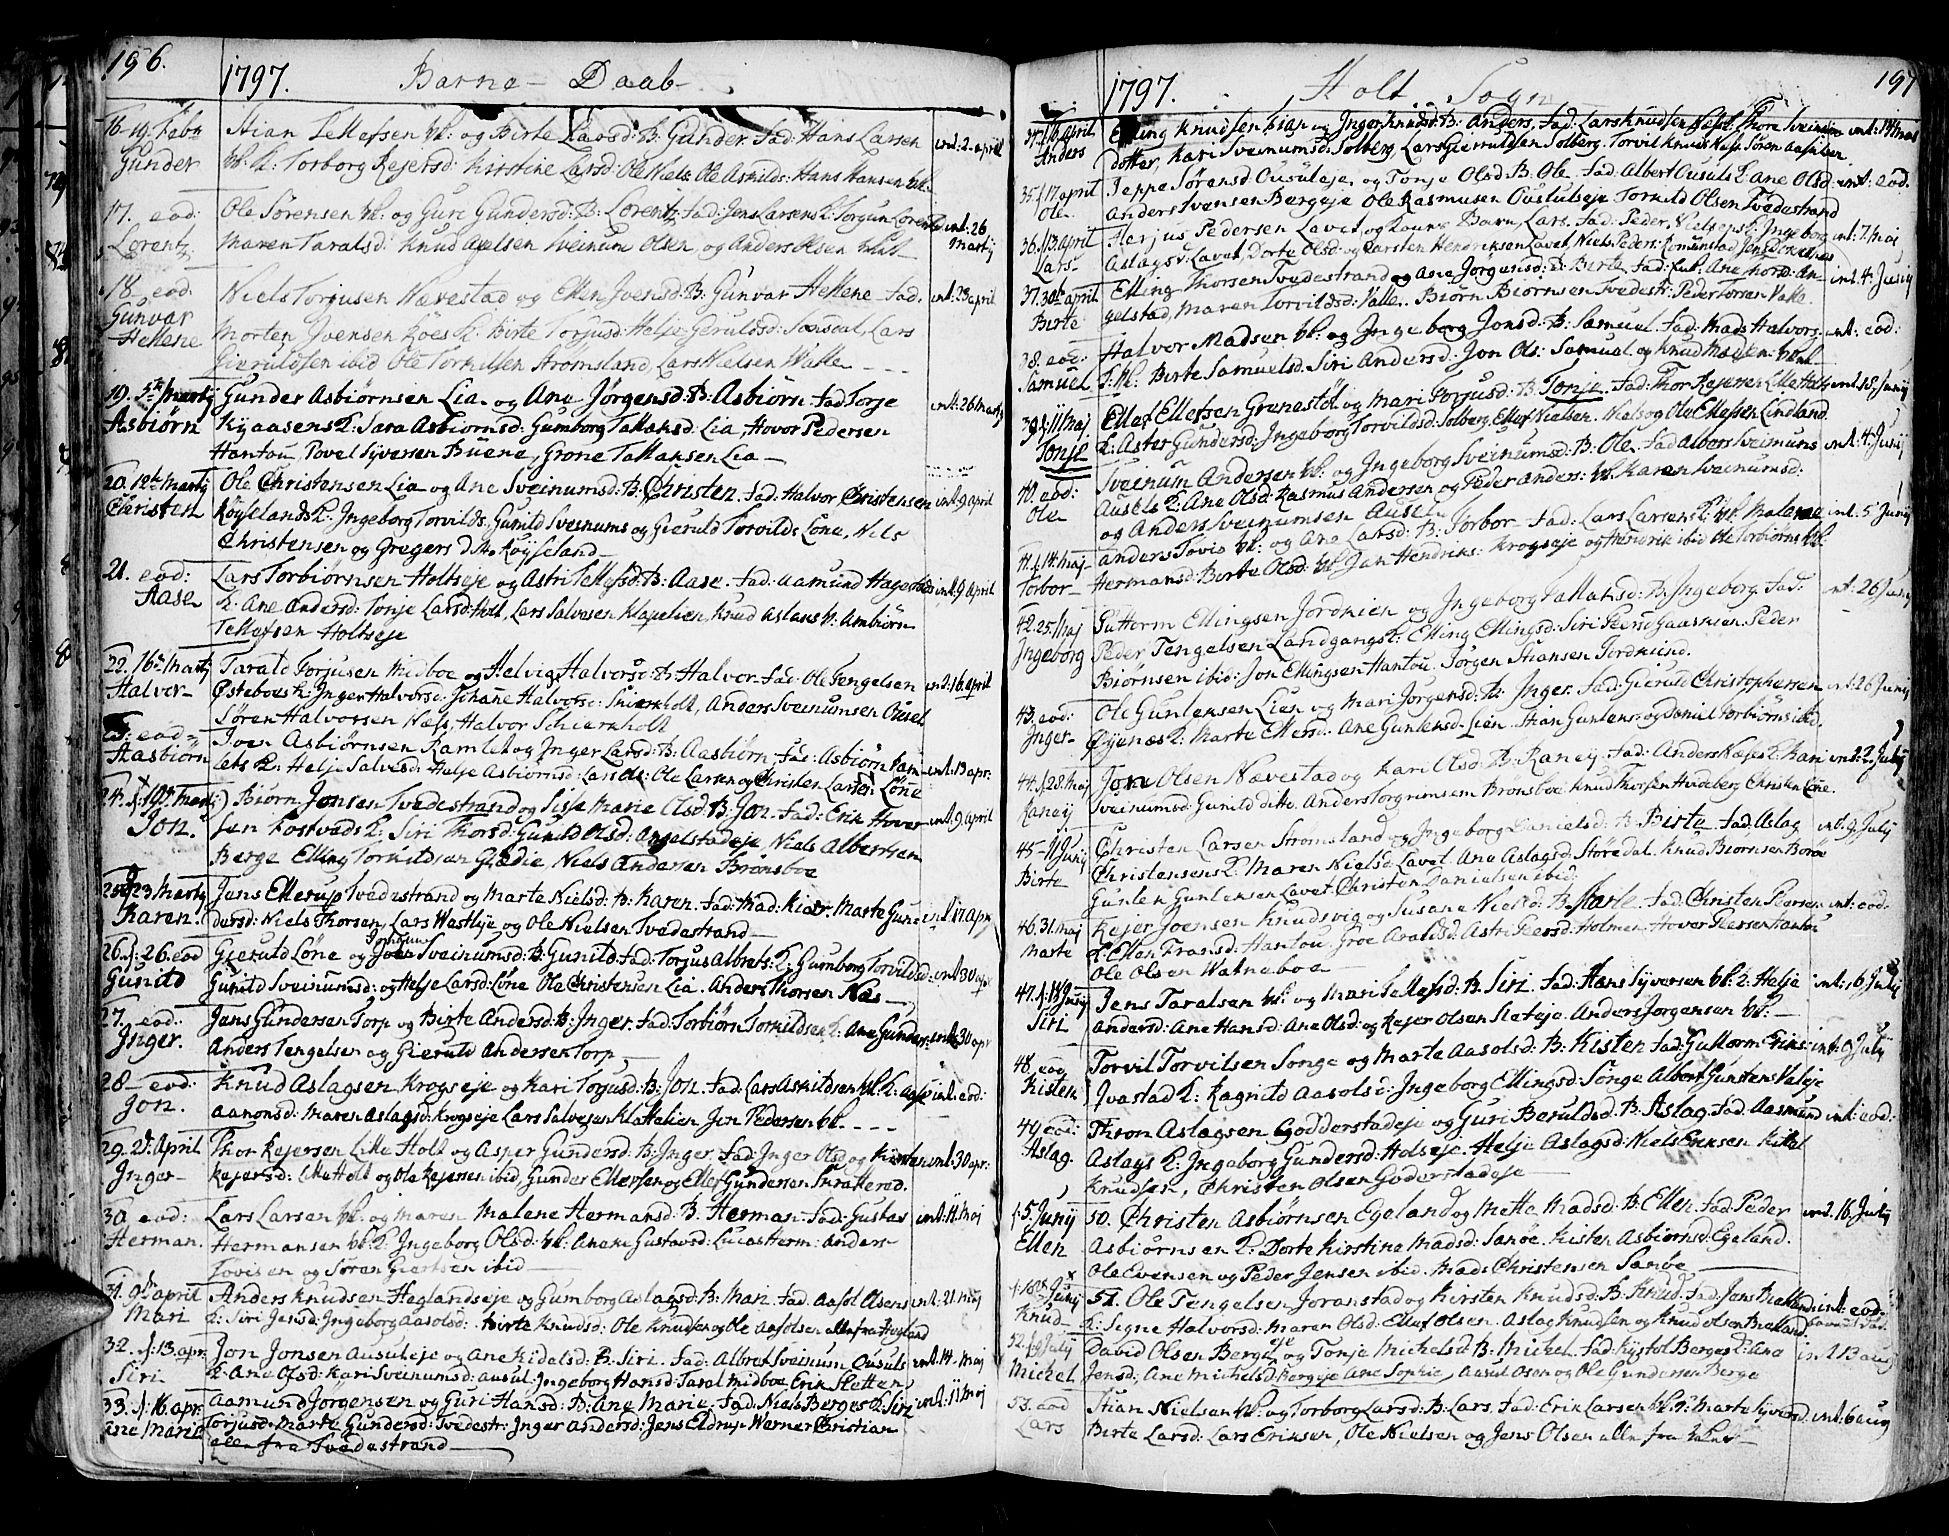 SAK, Holt sokneprestkontor, F/Fa/L0003: Parish register (official) no. A 3, 1765-1798, p. 196-197